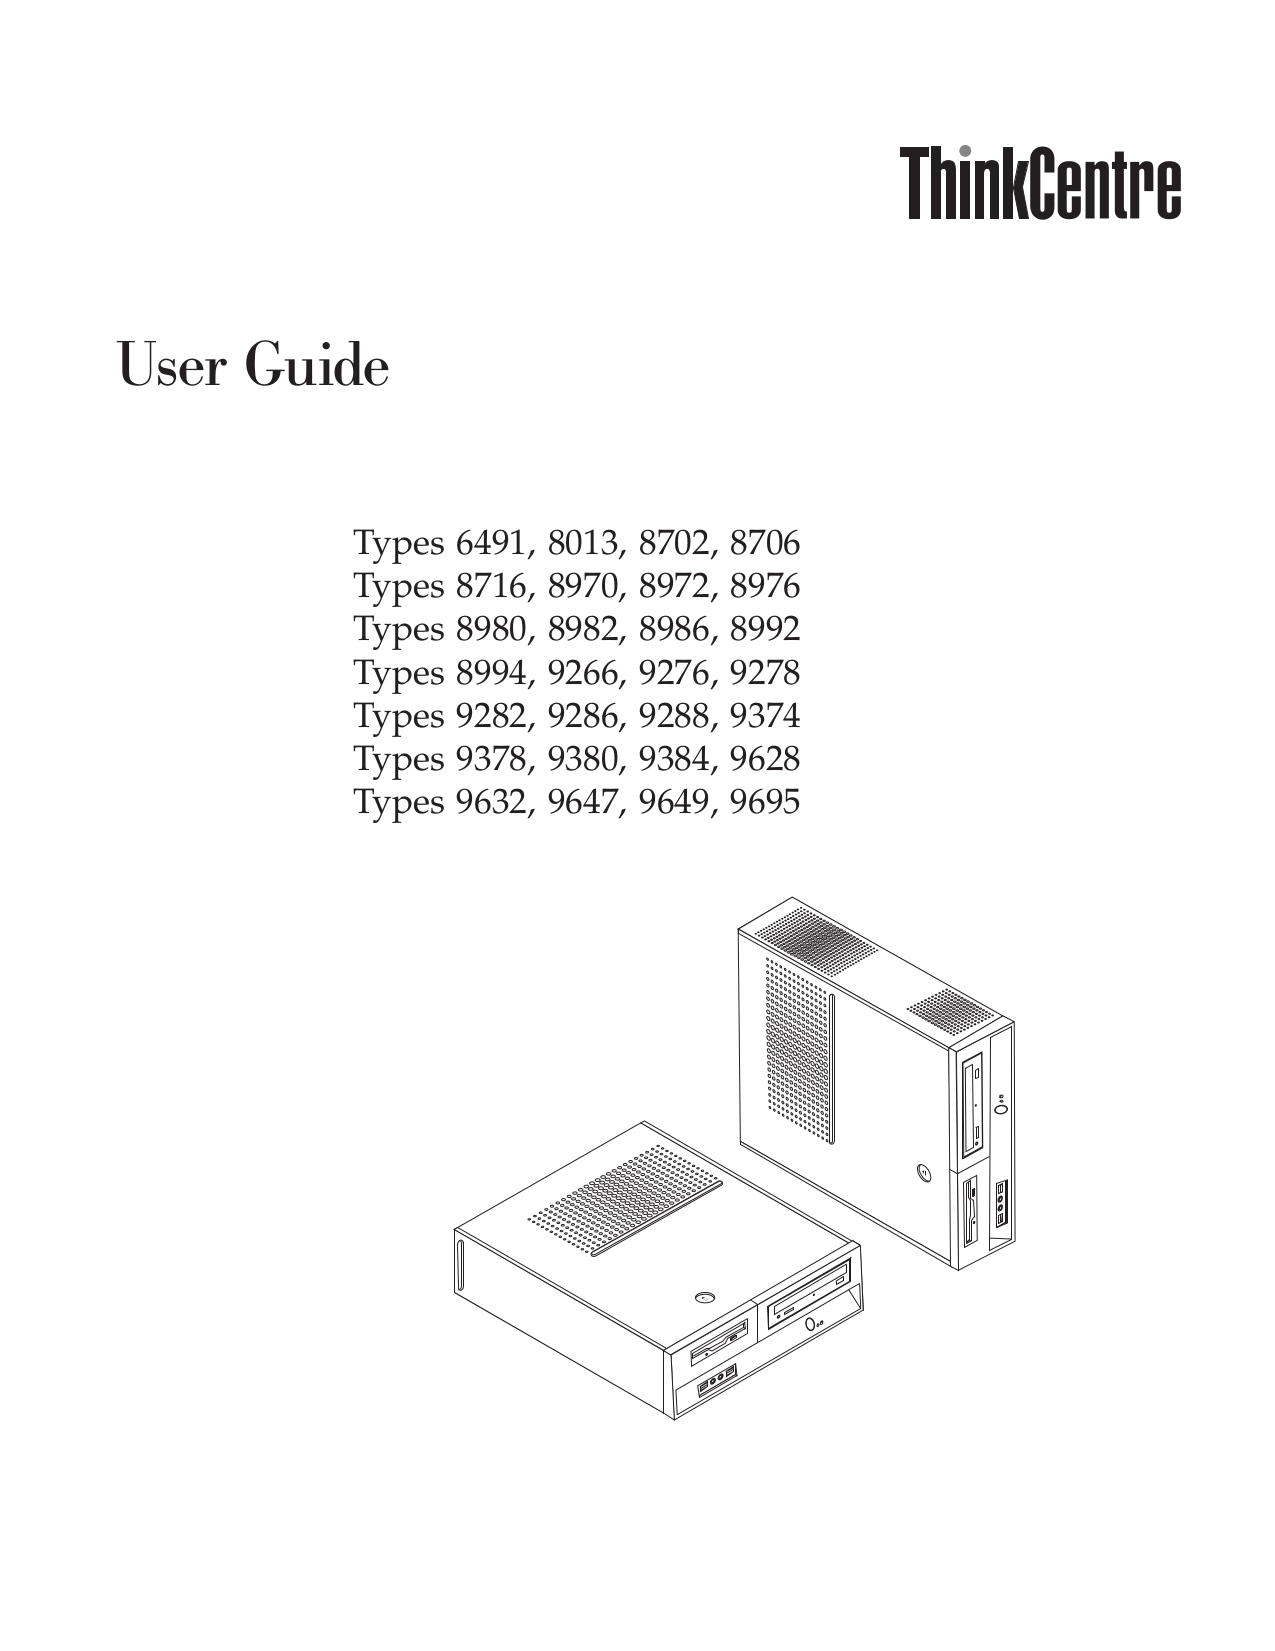 pdf for Lenovo Desktop ThinkCentre M55e 9649 manual